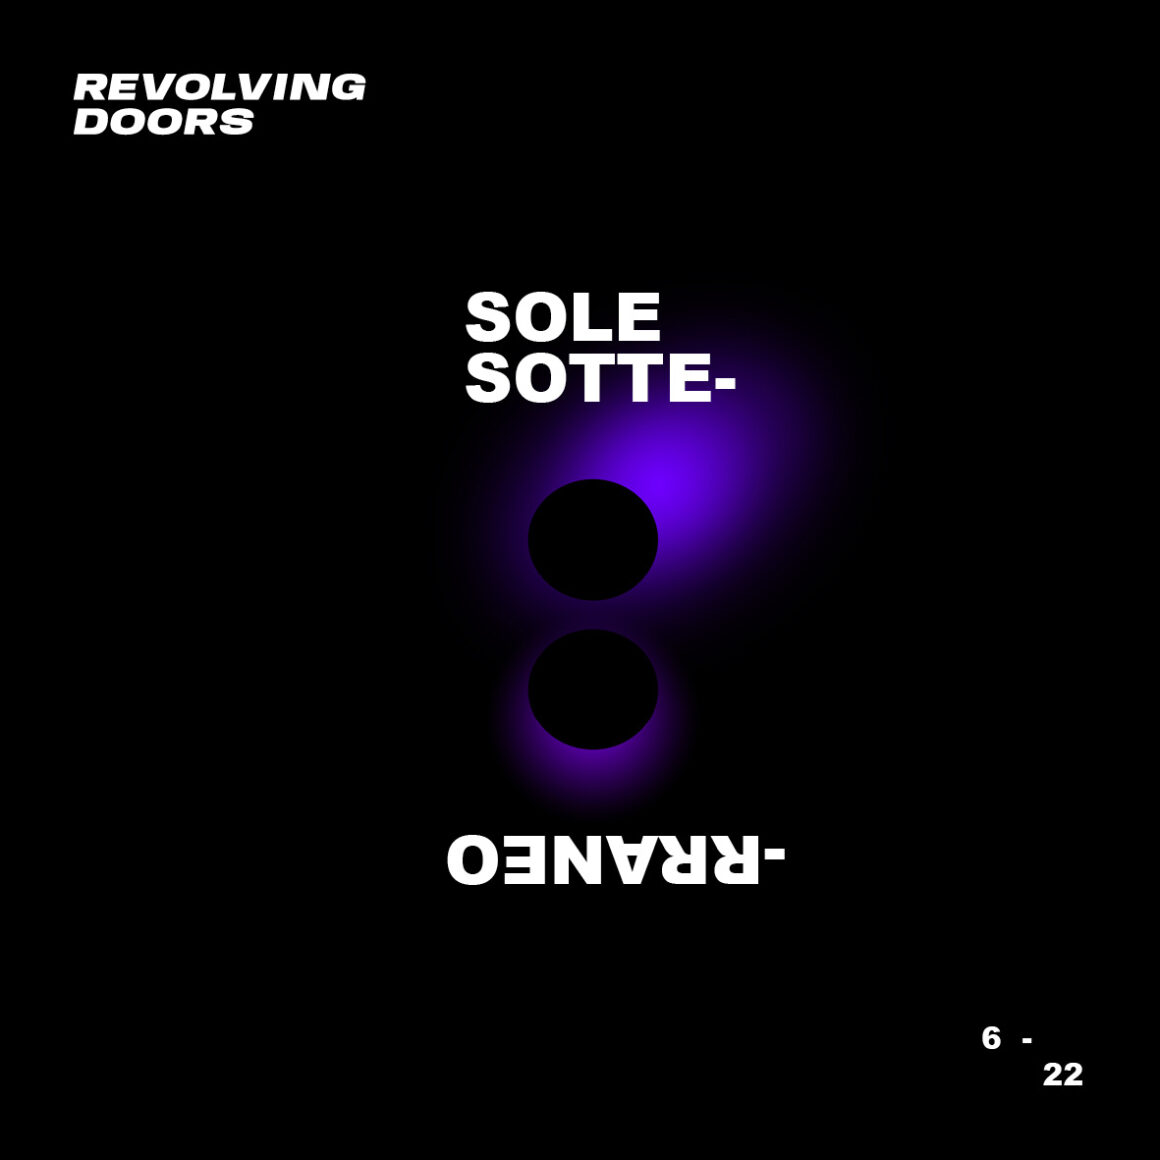 RevolvingDoors – Sole Sottrreaneo